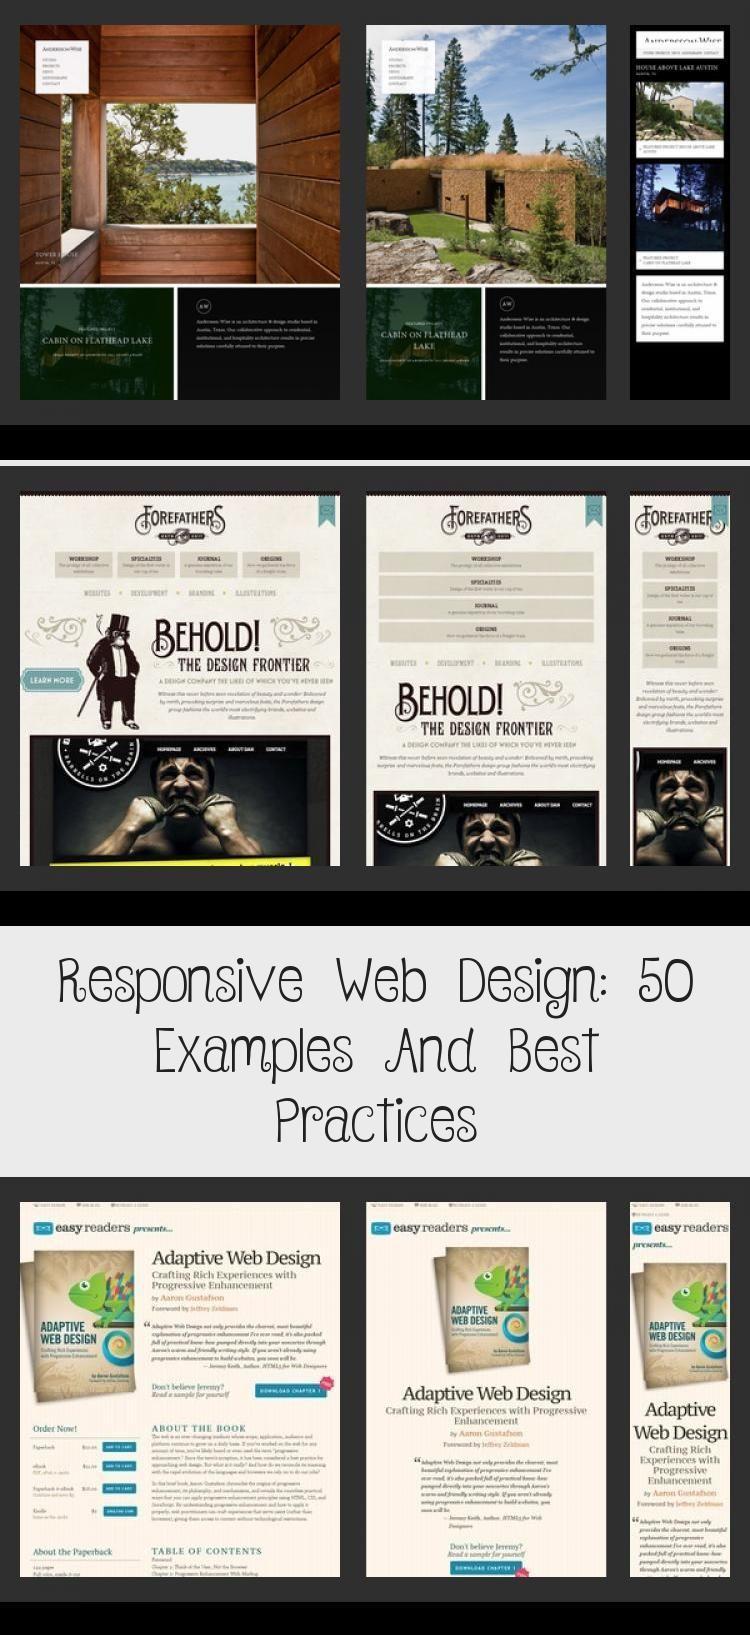 En Blog En Blog In 2020 Web Design Adaptive Design Responsive Design Examples